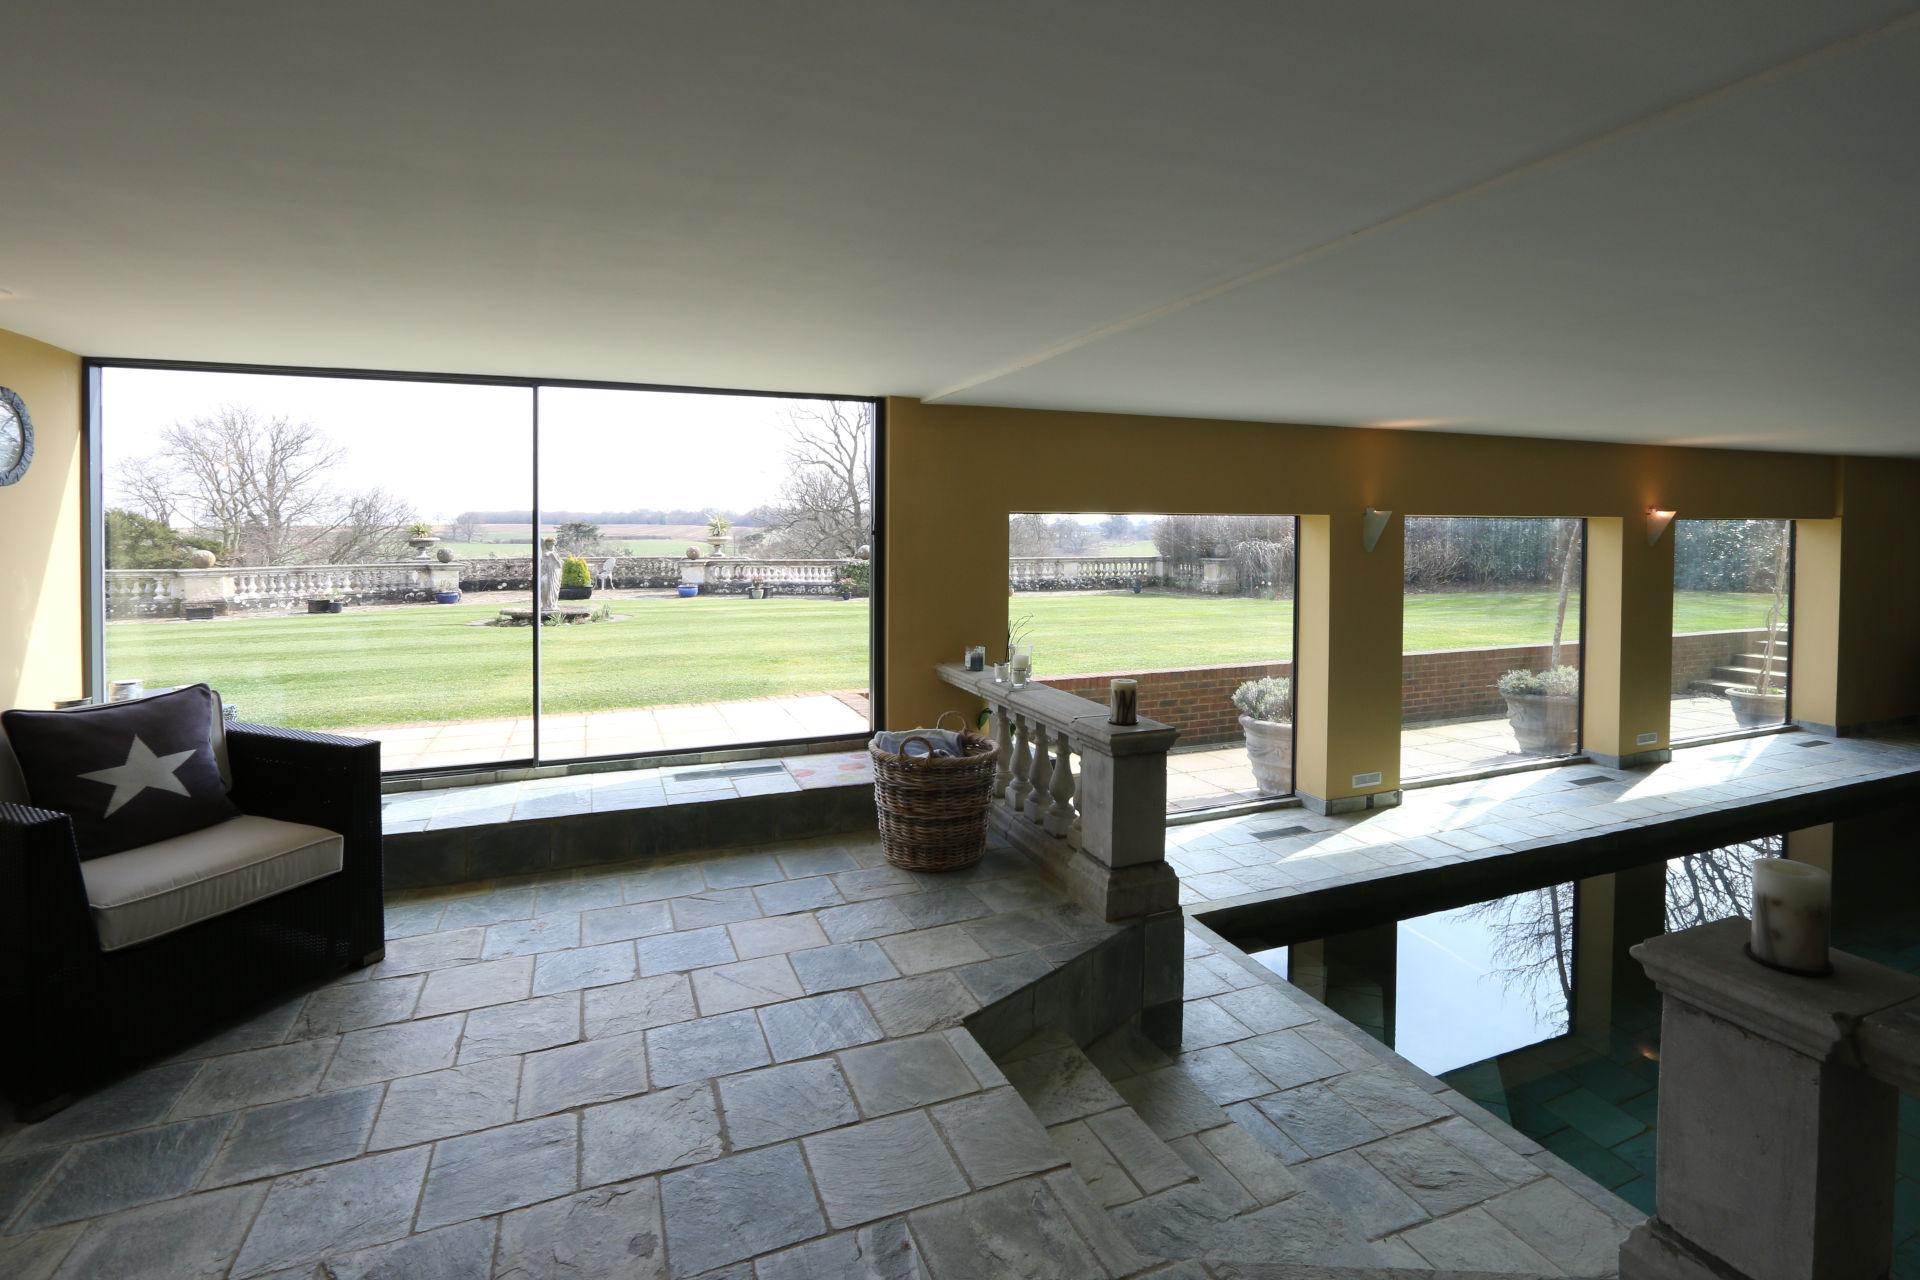 dunloran_house_minimal-windows-sliding-glass-doors